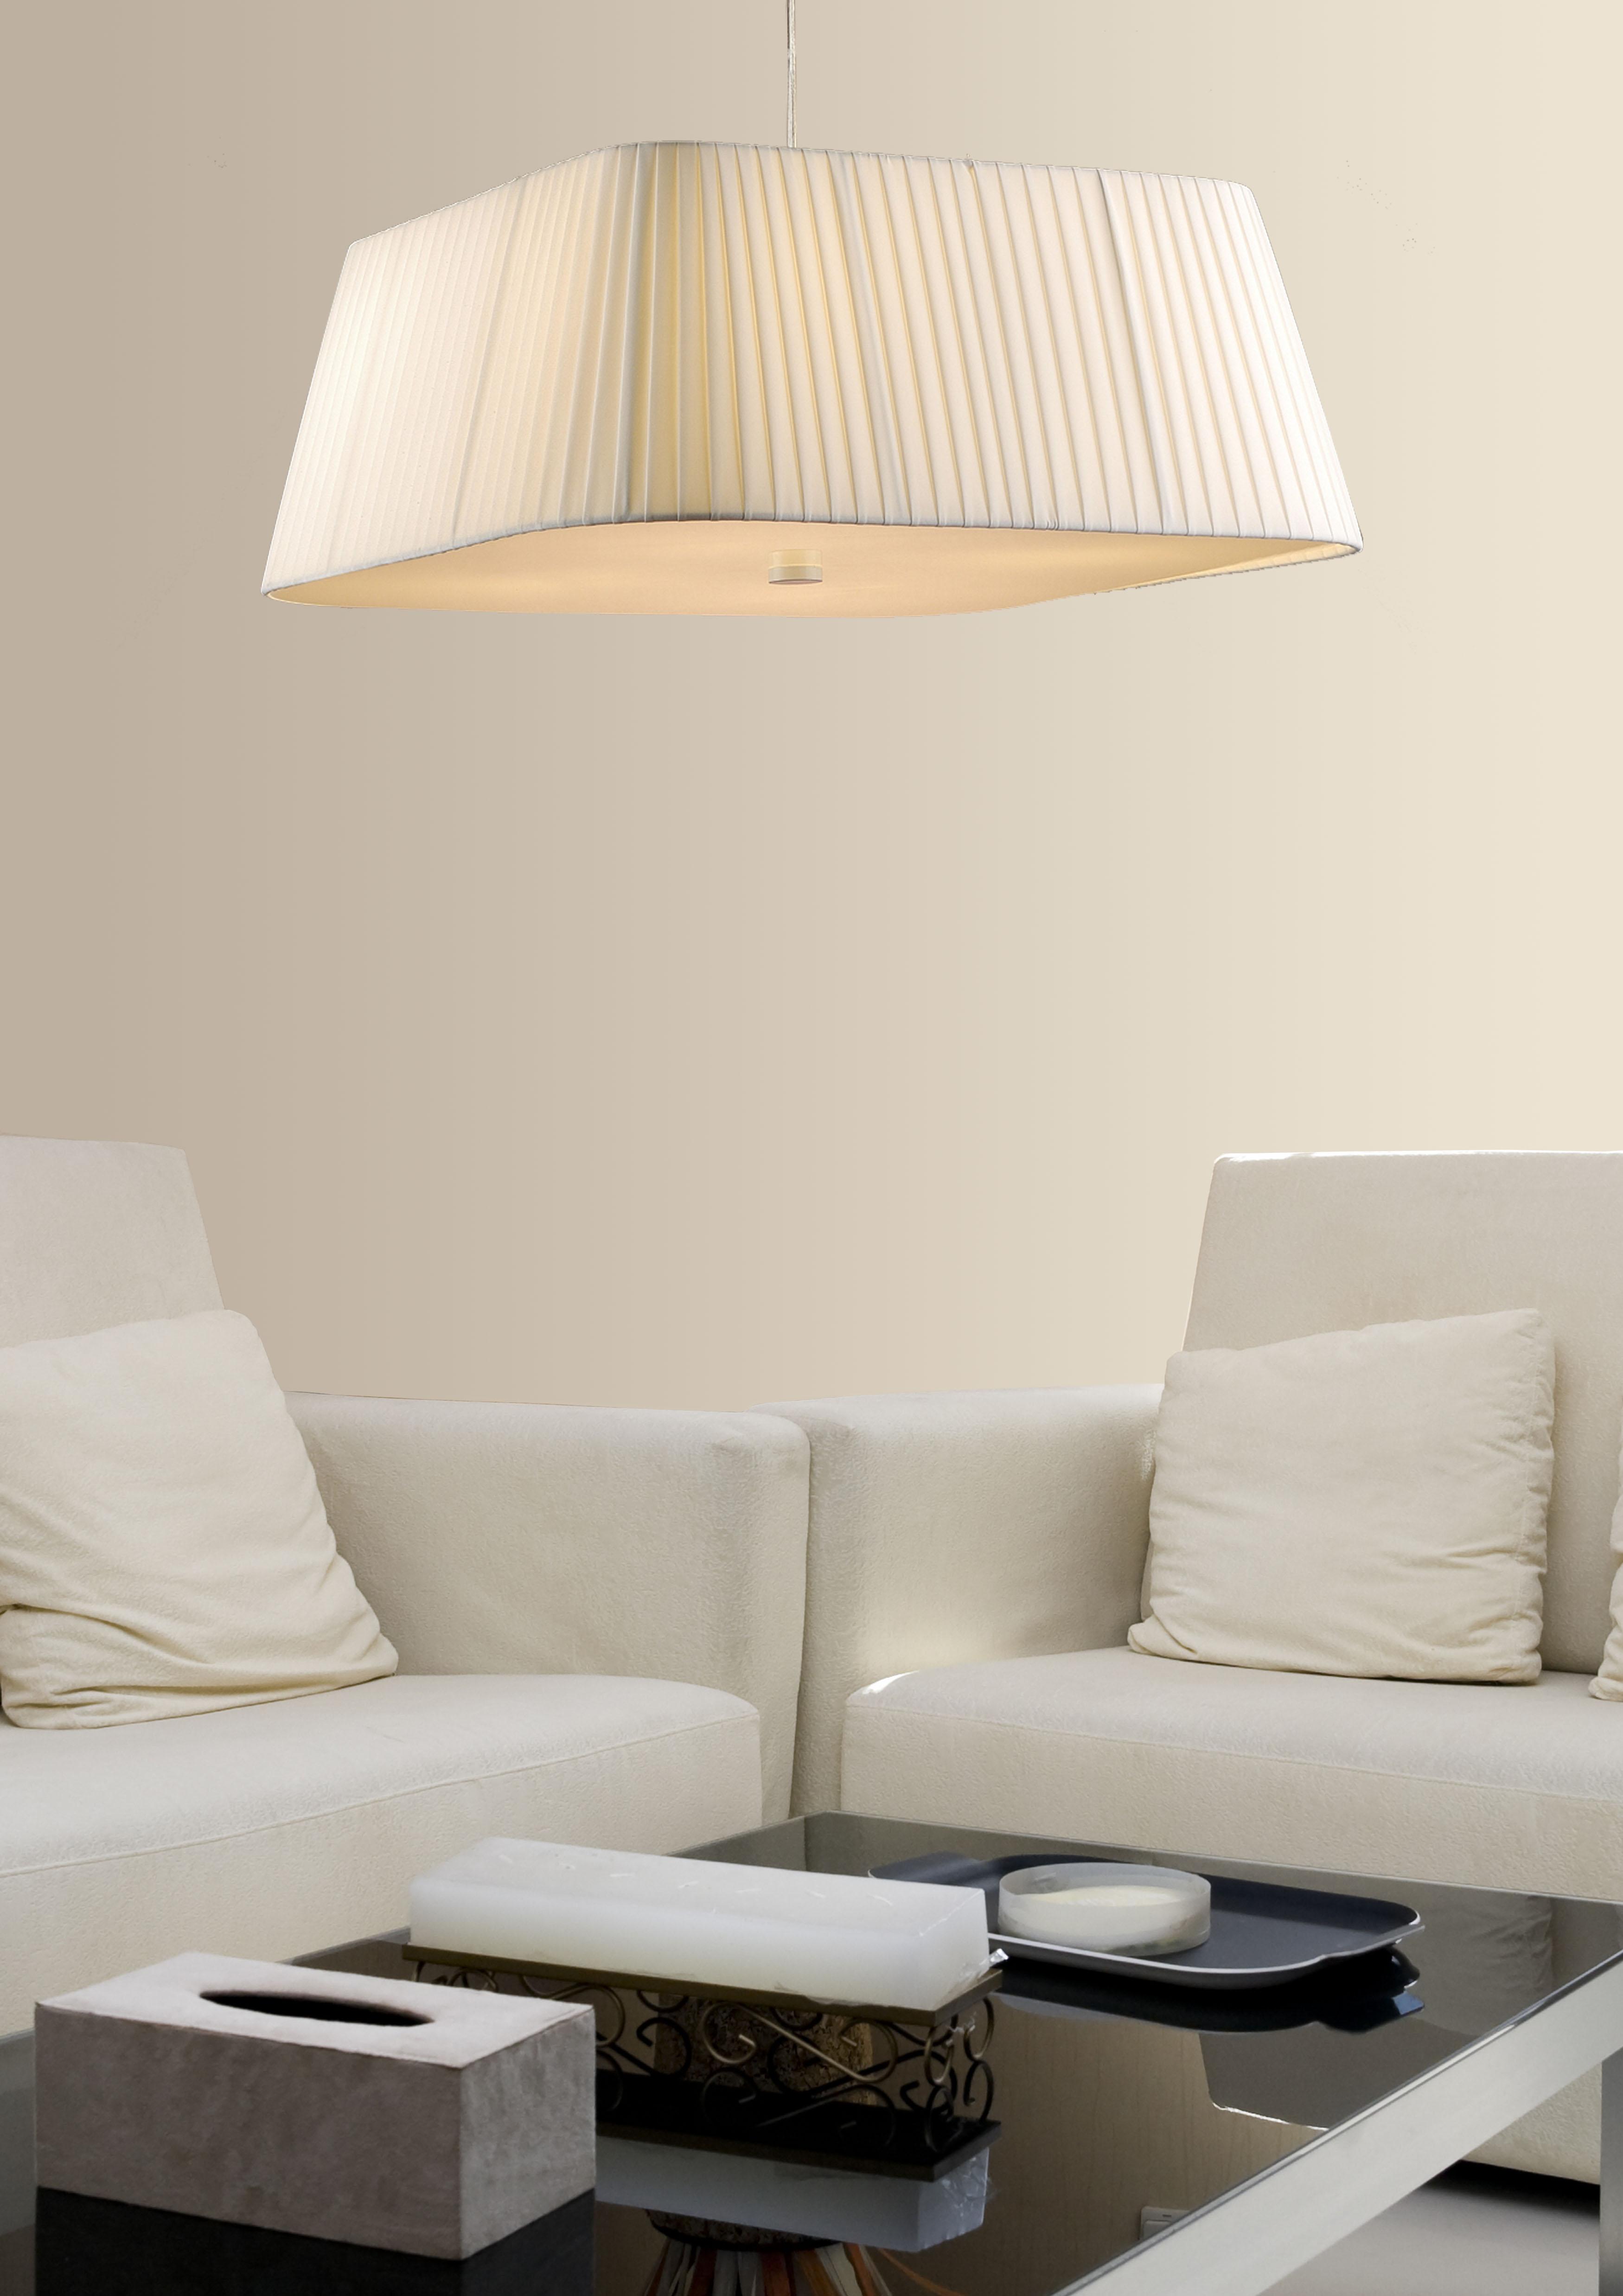 Lamparas pantallas de tela  iluminacion online